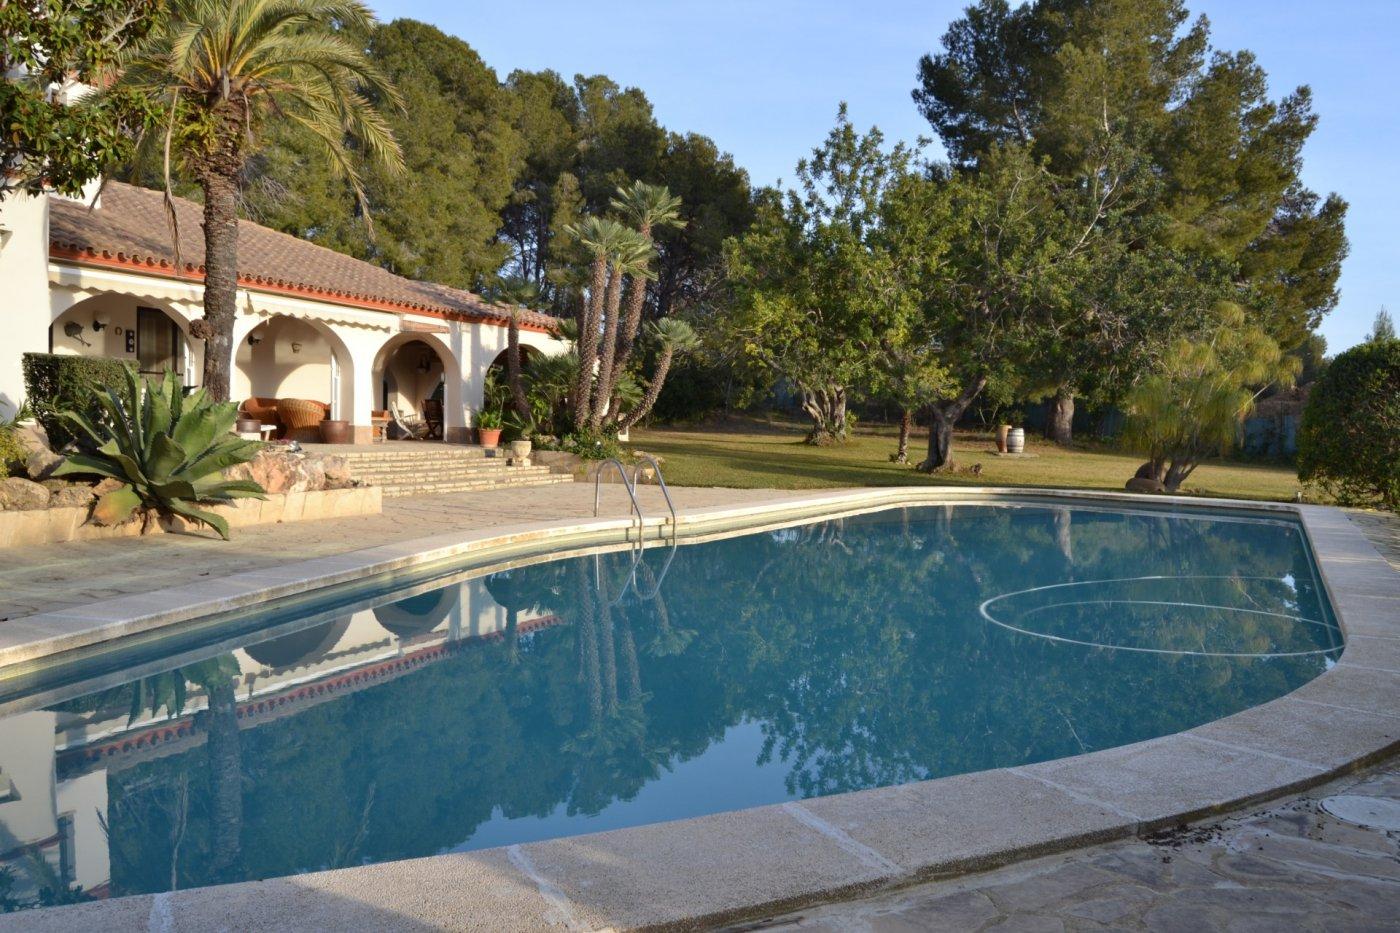 Casa  Carretera carretera de gaià. Magnifica masia exclusiva con piscina y terreno